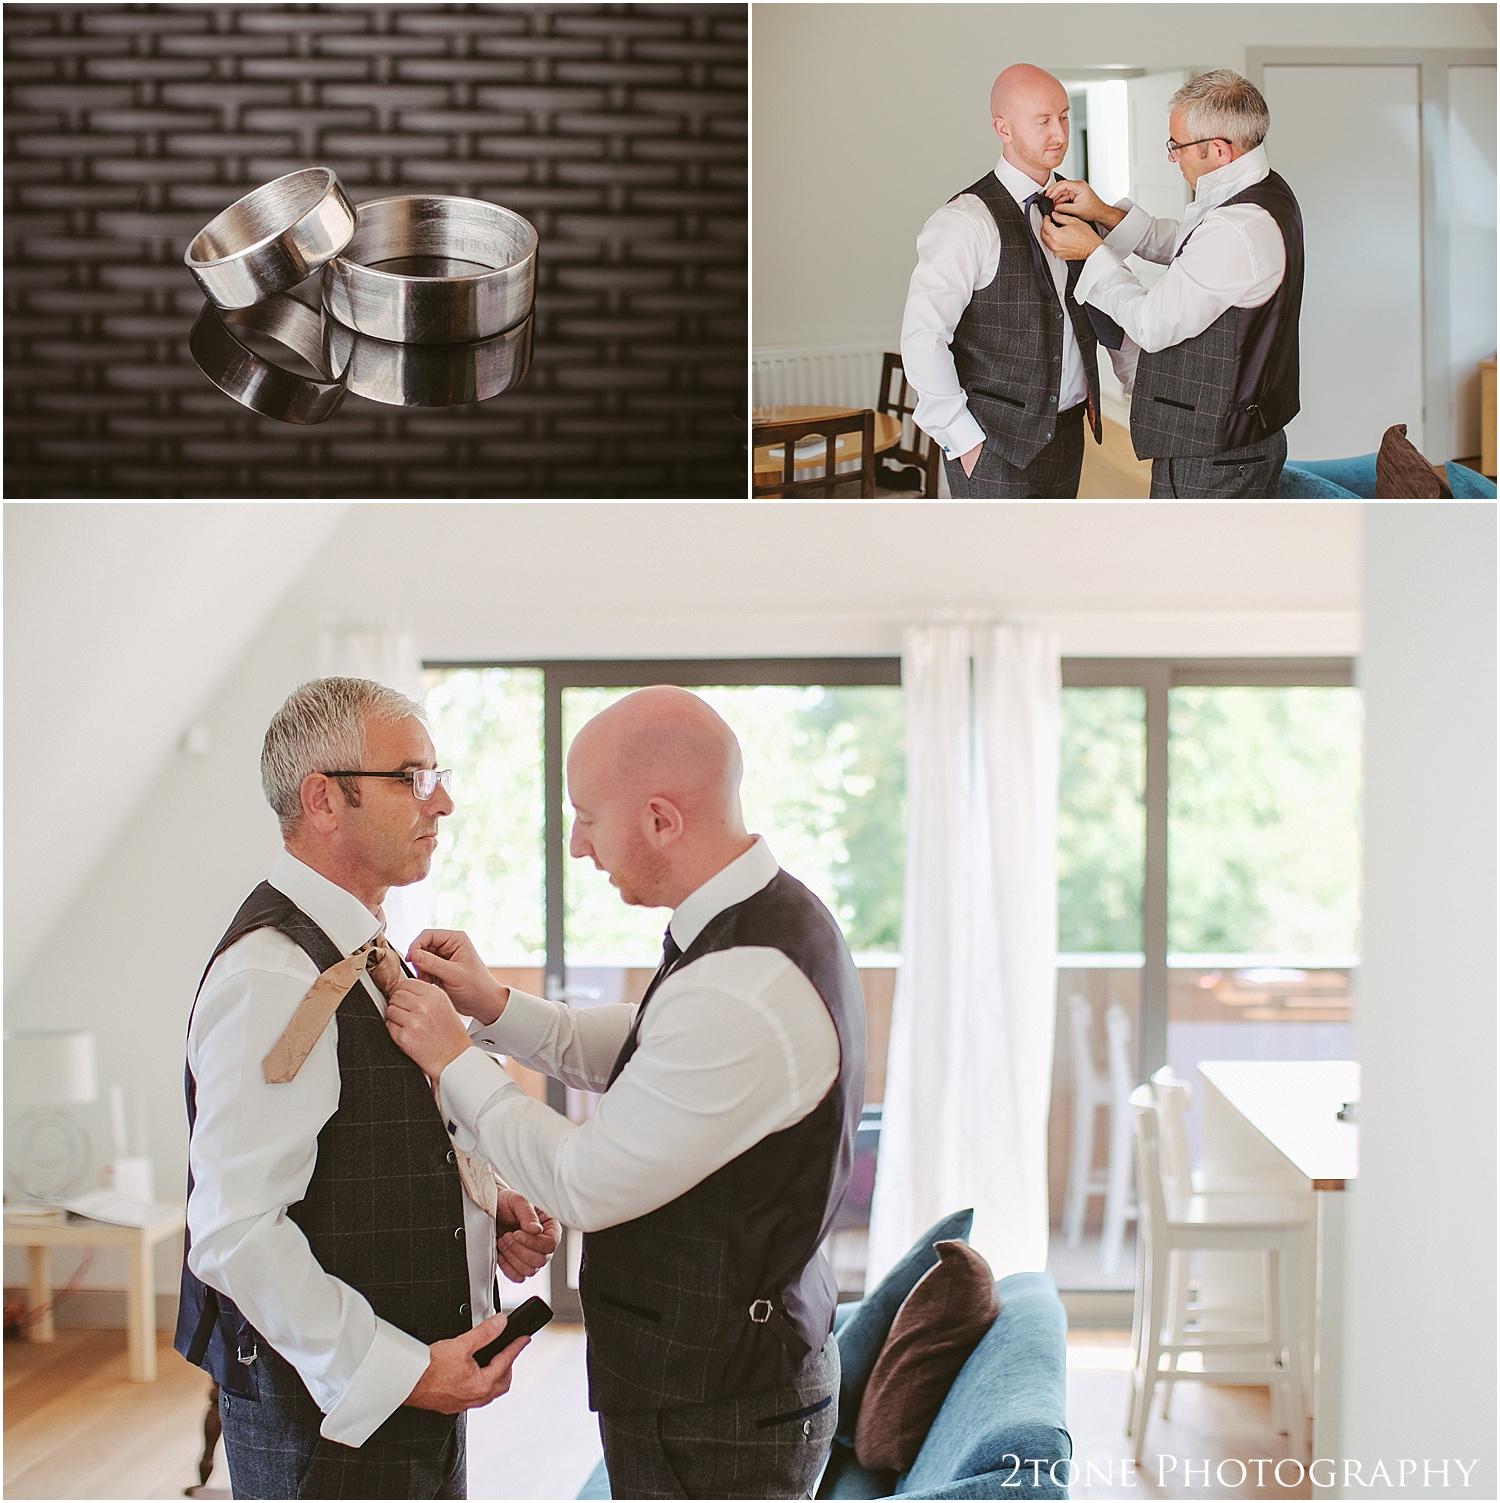 Crook Hall wedding photographer 002.jpg